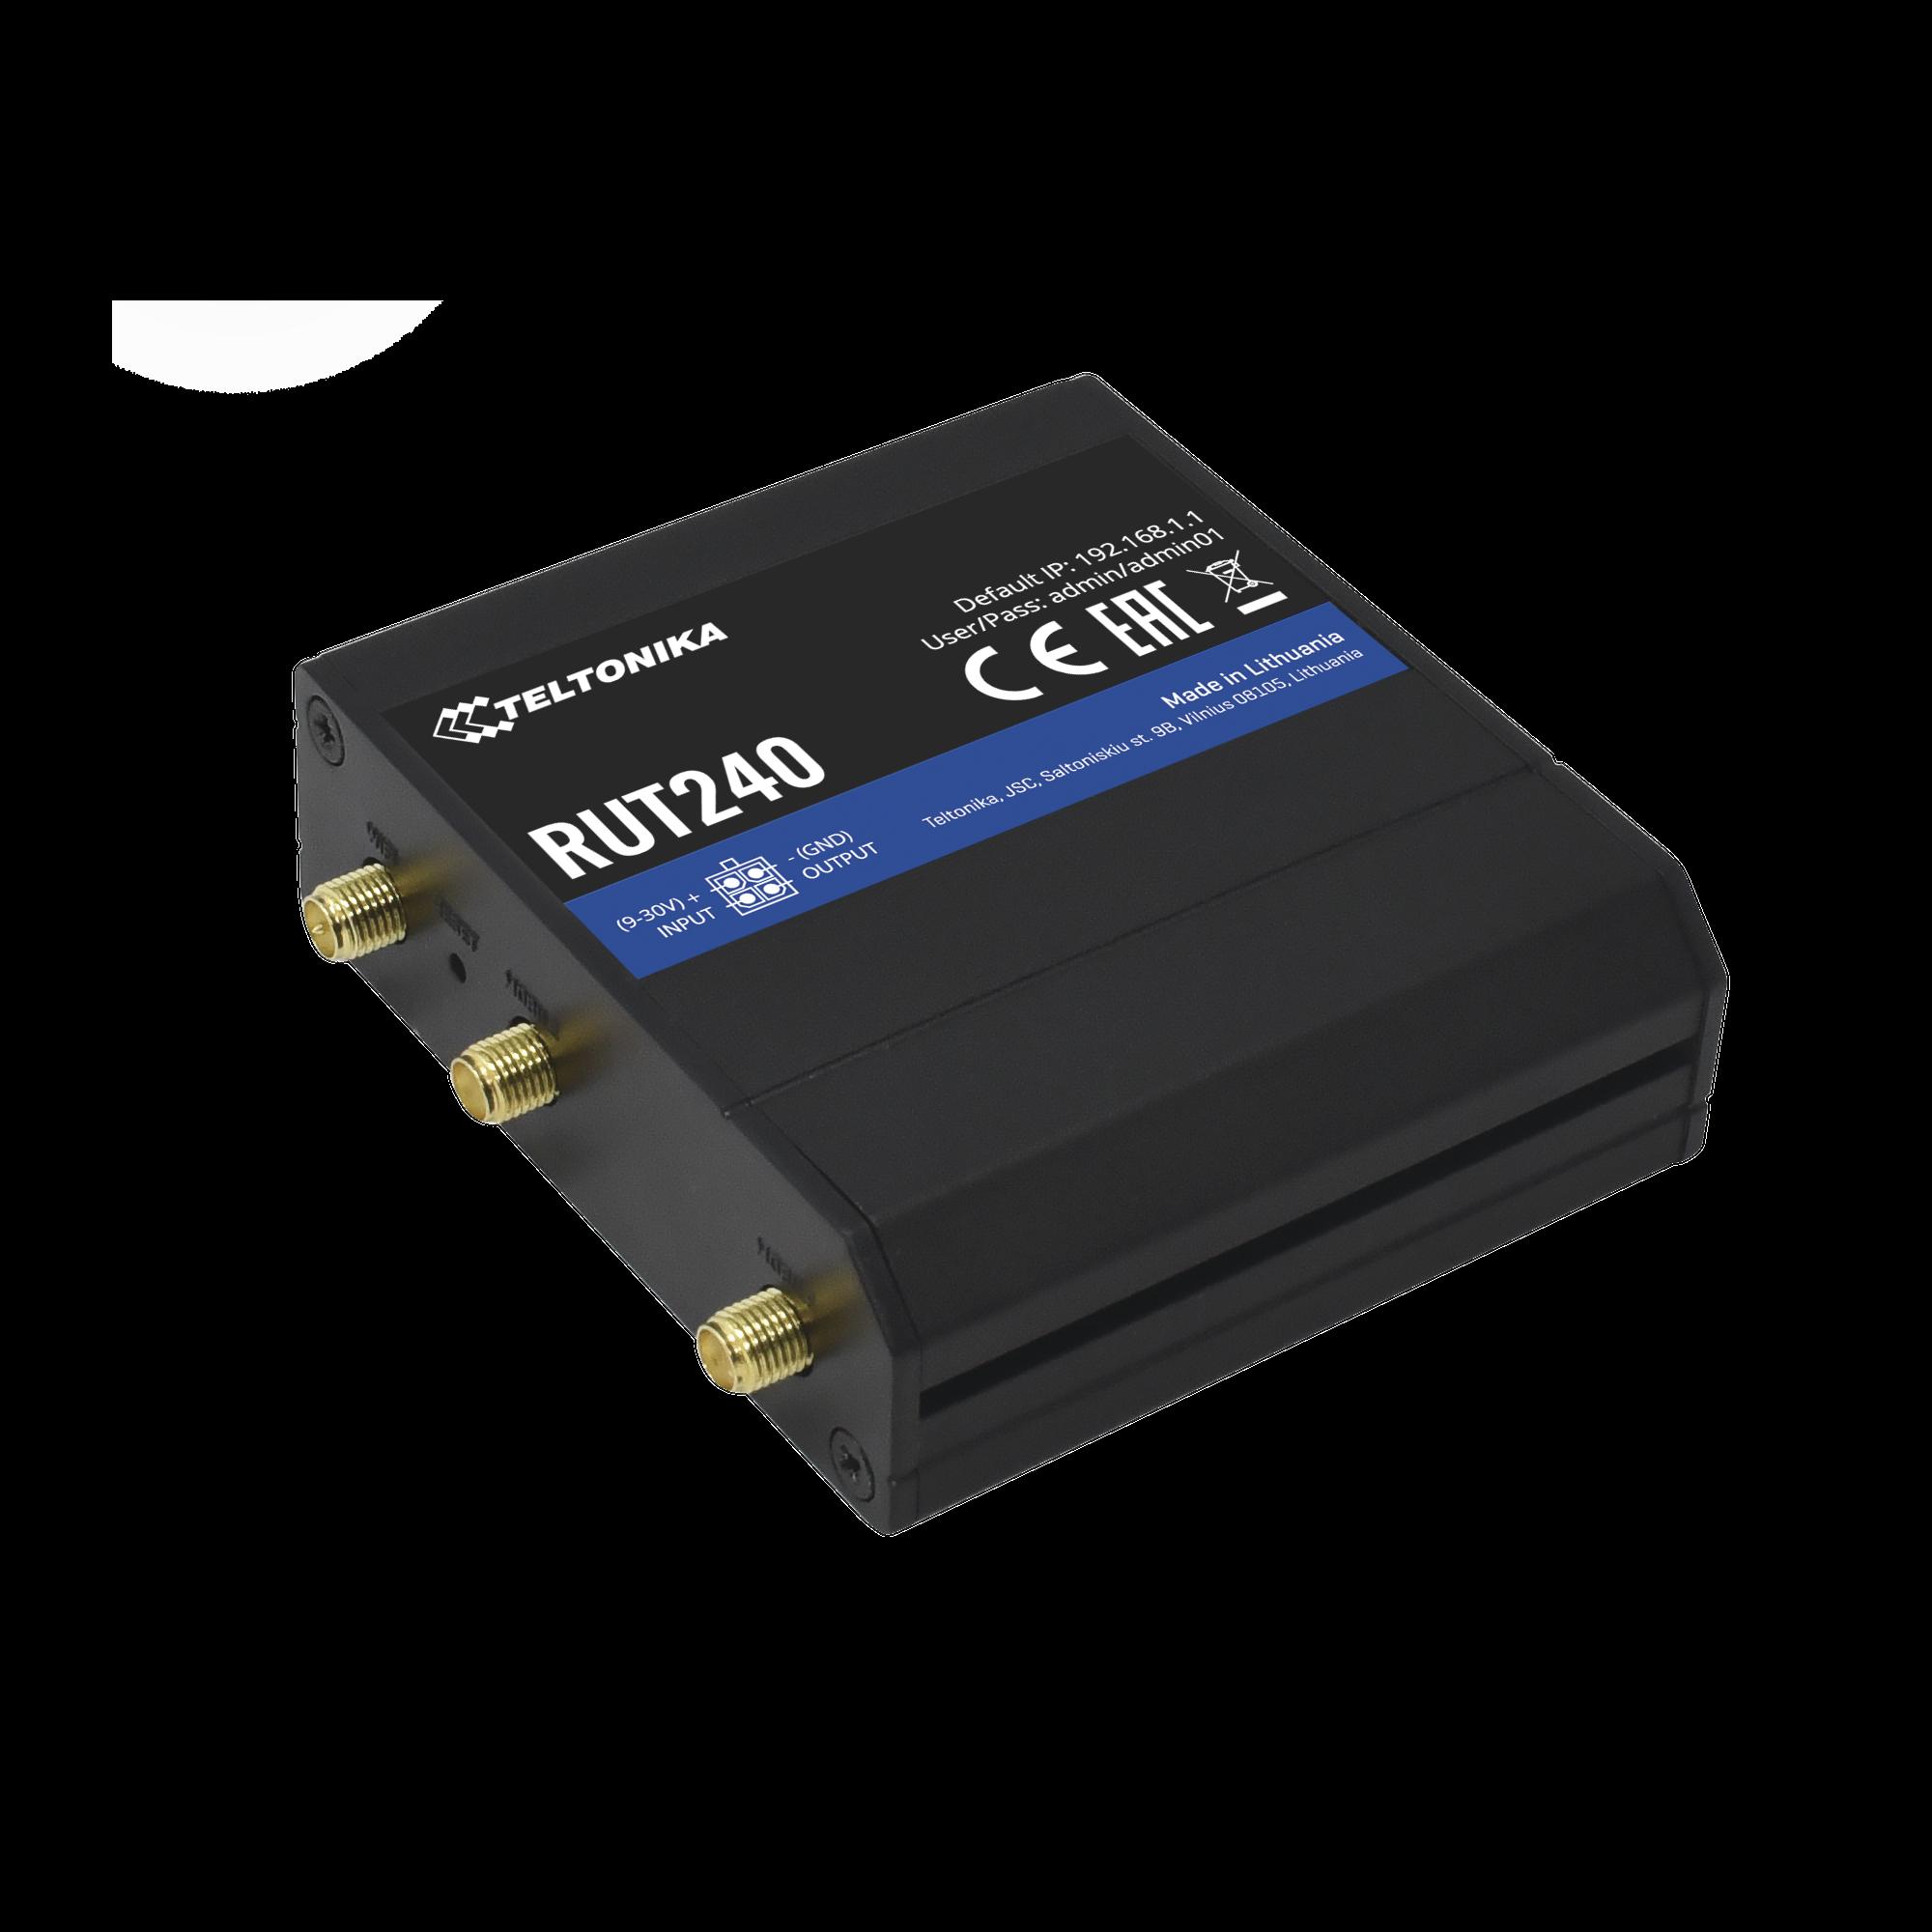 Router LTE, Slot para SIM, 2 puertos Ethernet 10/100 Mbps, Wi-Fi 2.4 GHz, Interfaz Amigable, Bandas B1, B2, B3, B4, B5, B7, B8, B28